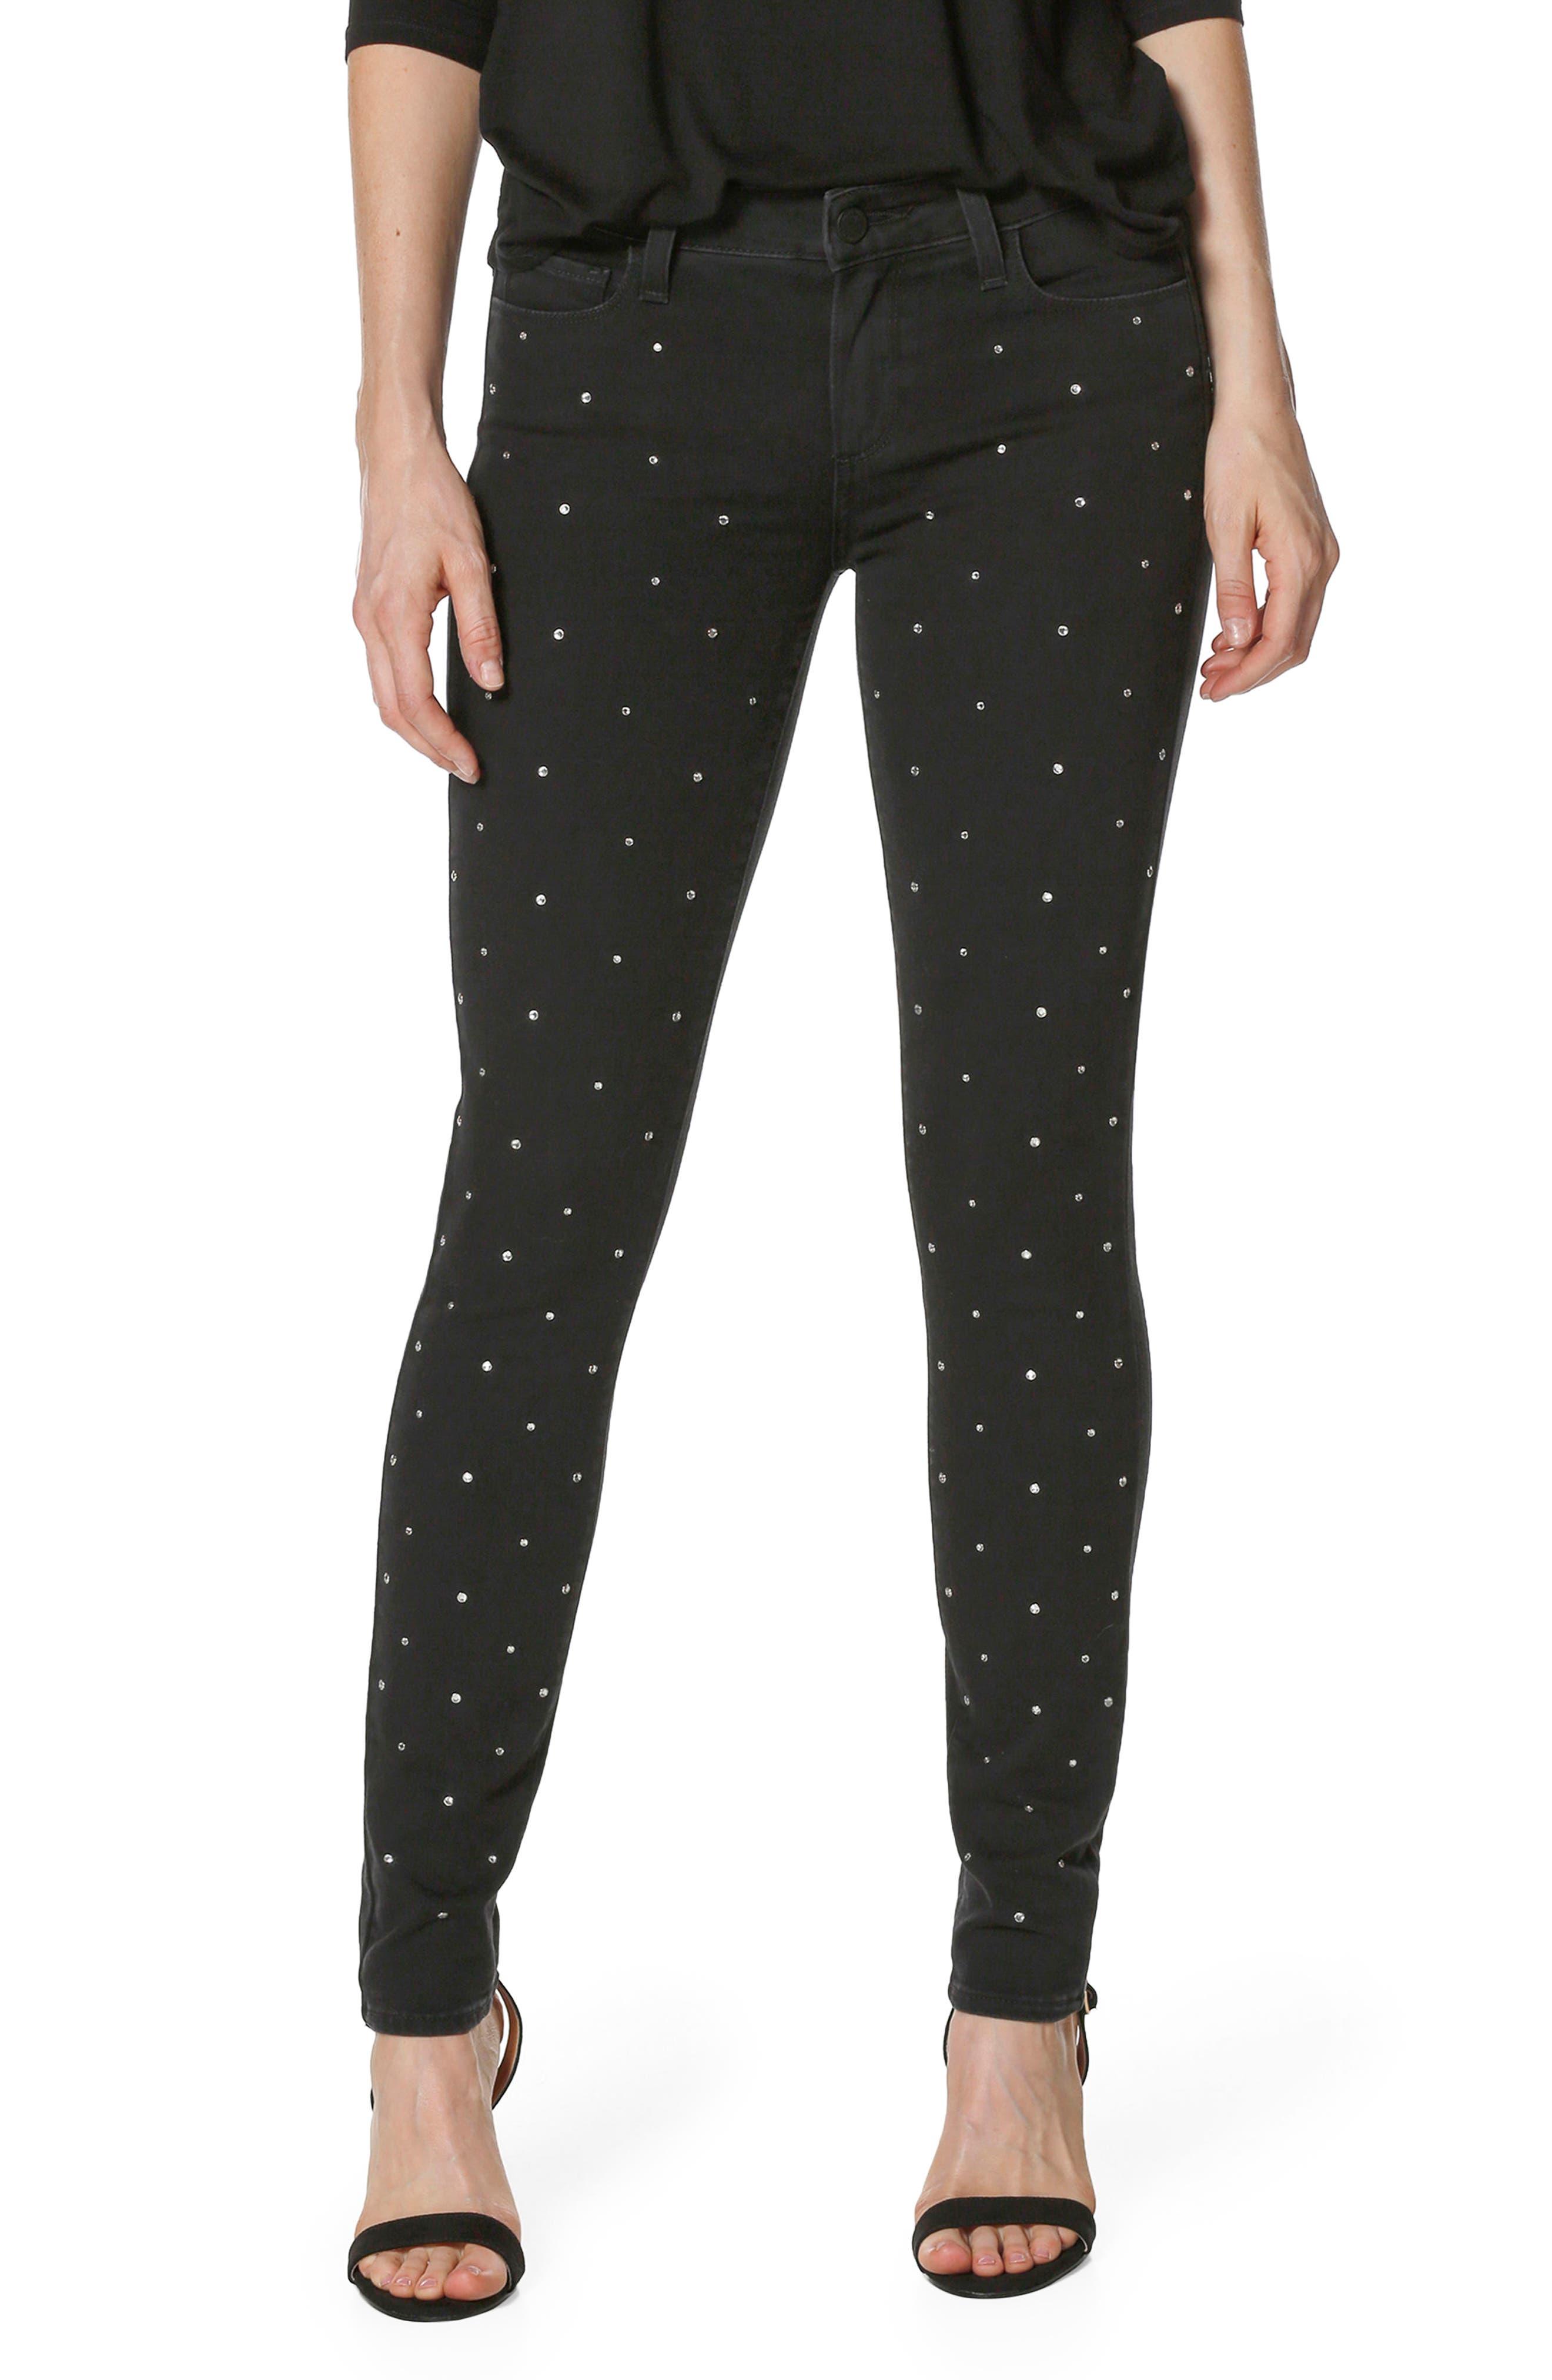 Verdugo Crystal Ultra Skinny Jeans,                             Main thumbnail 1, color,                             Noir Krystal